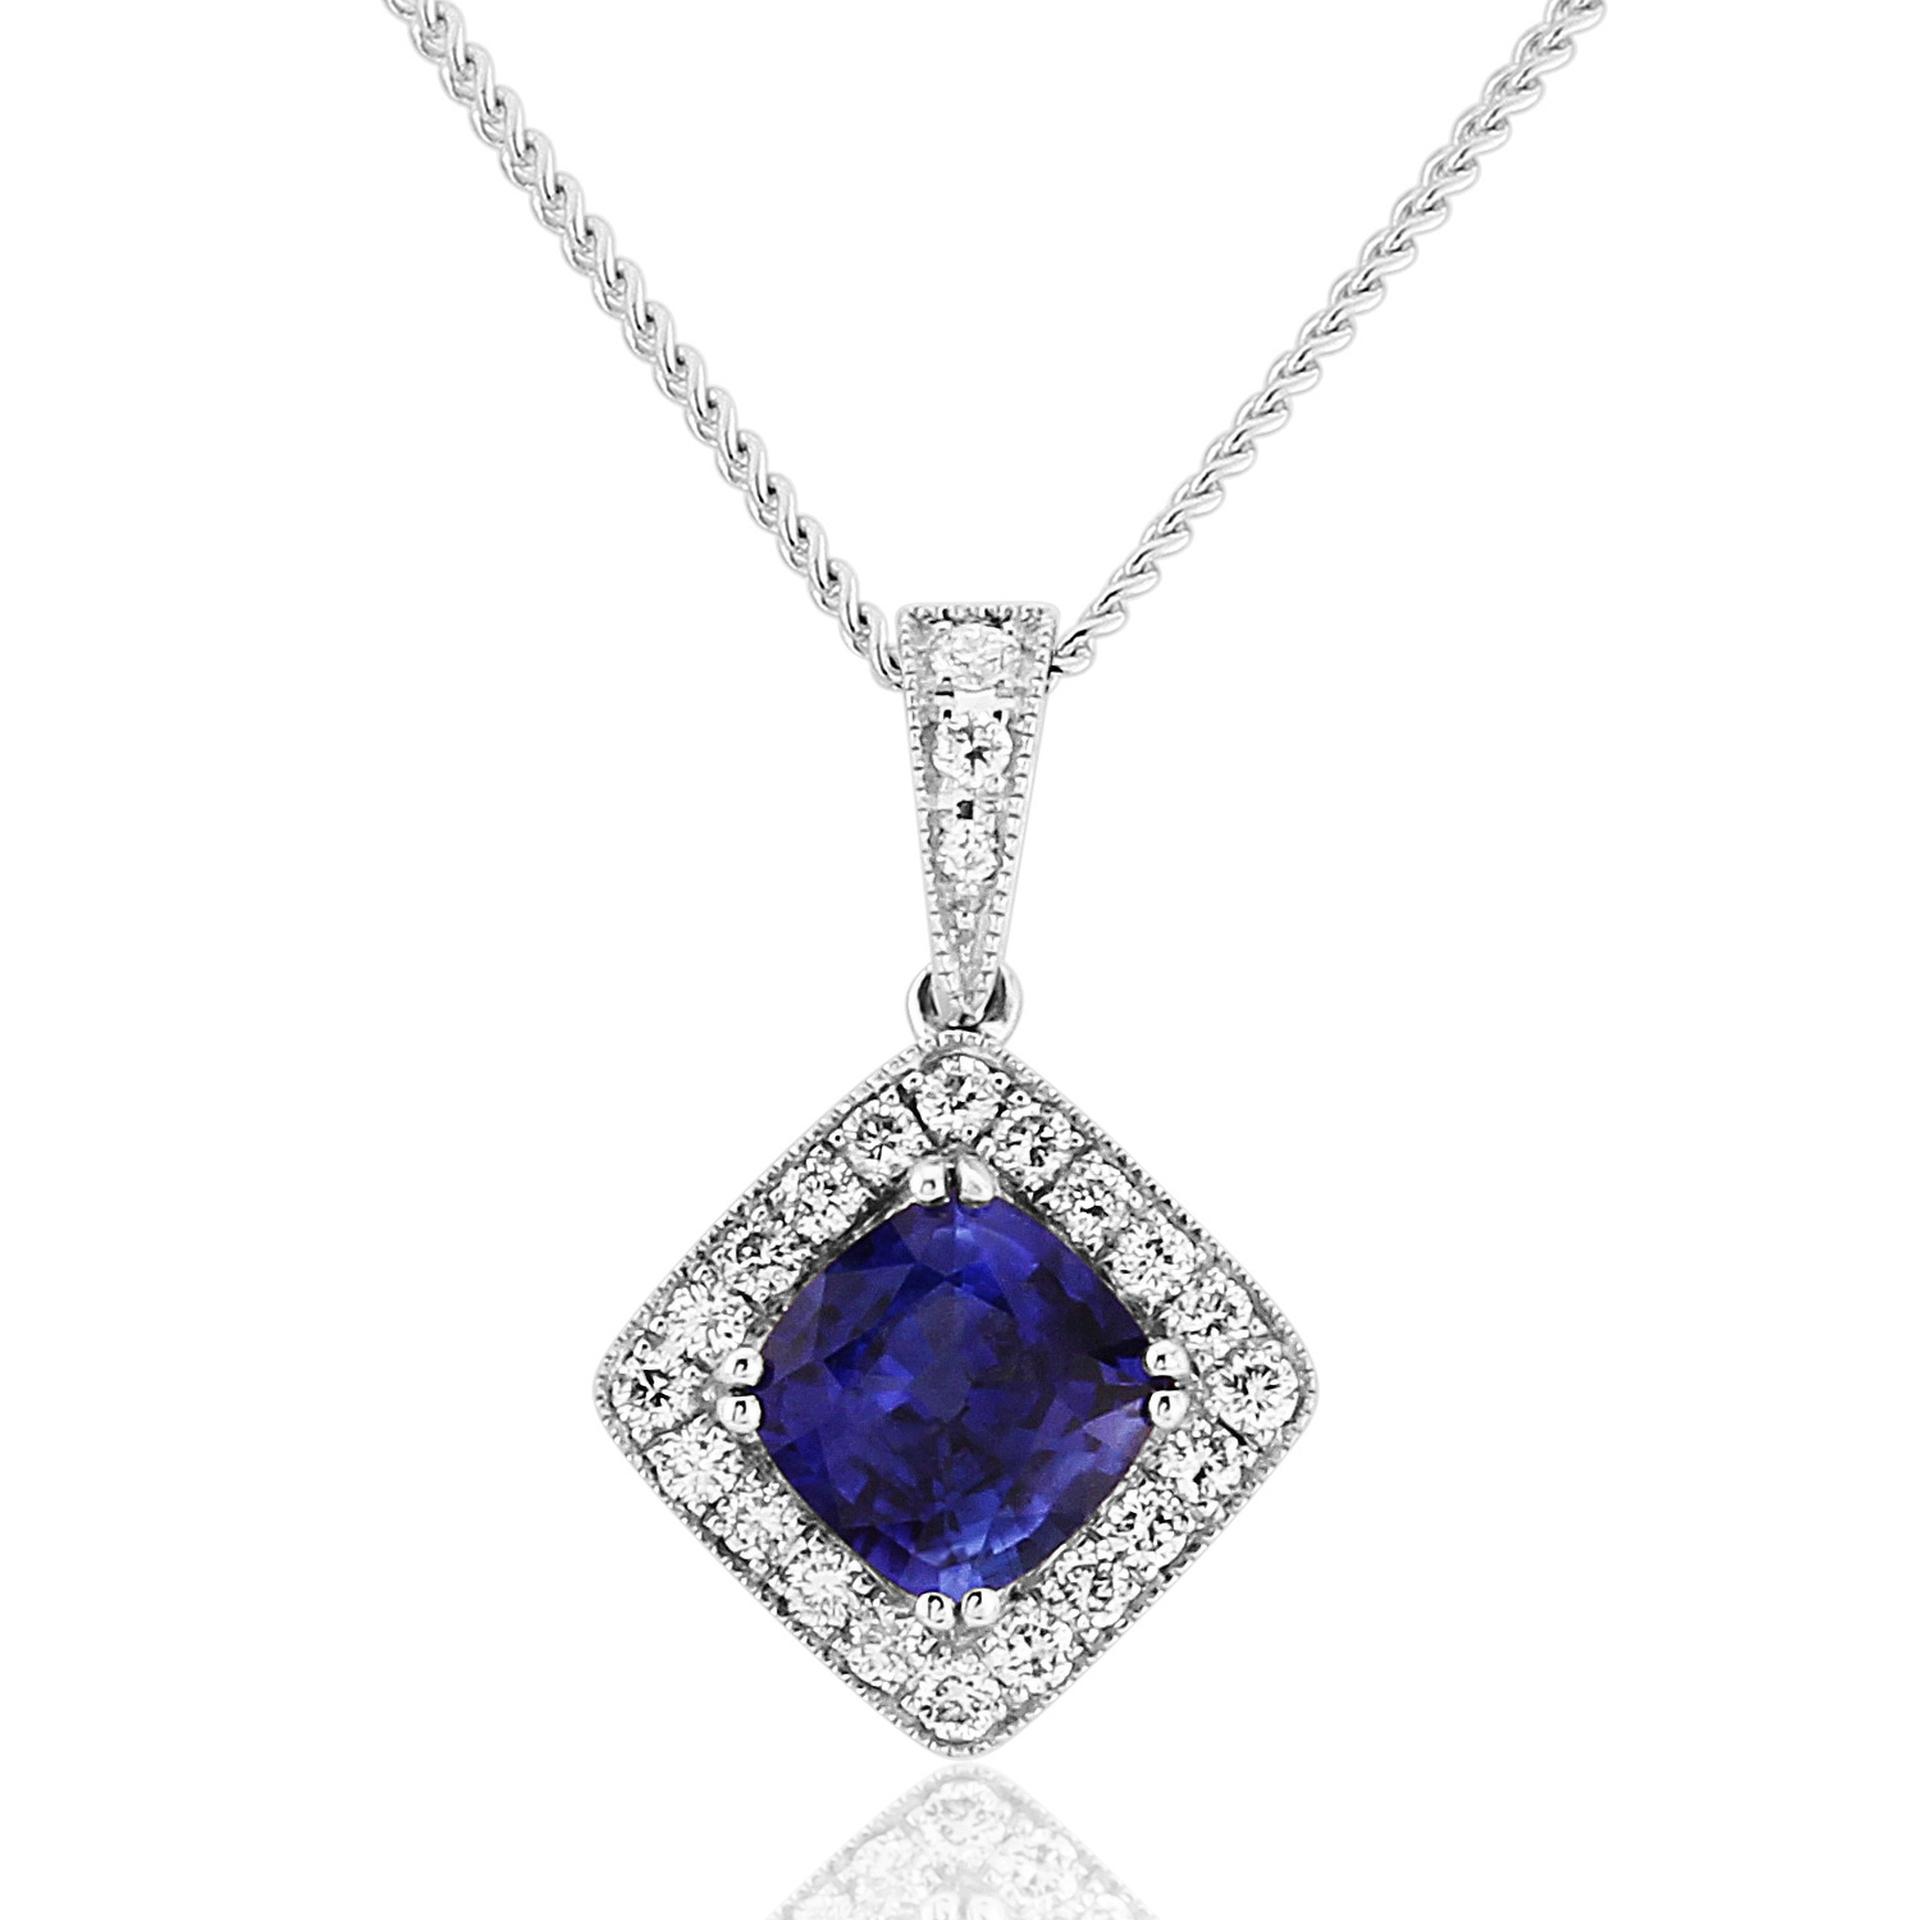 18ct White Gold Round Sapphire and Diamond Off Square Pendant